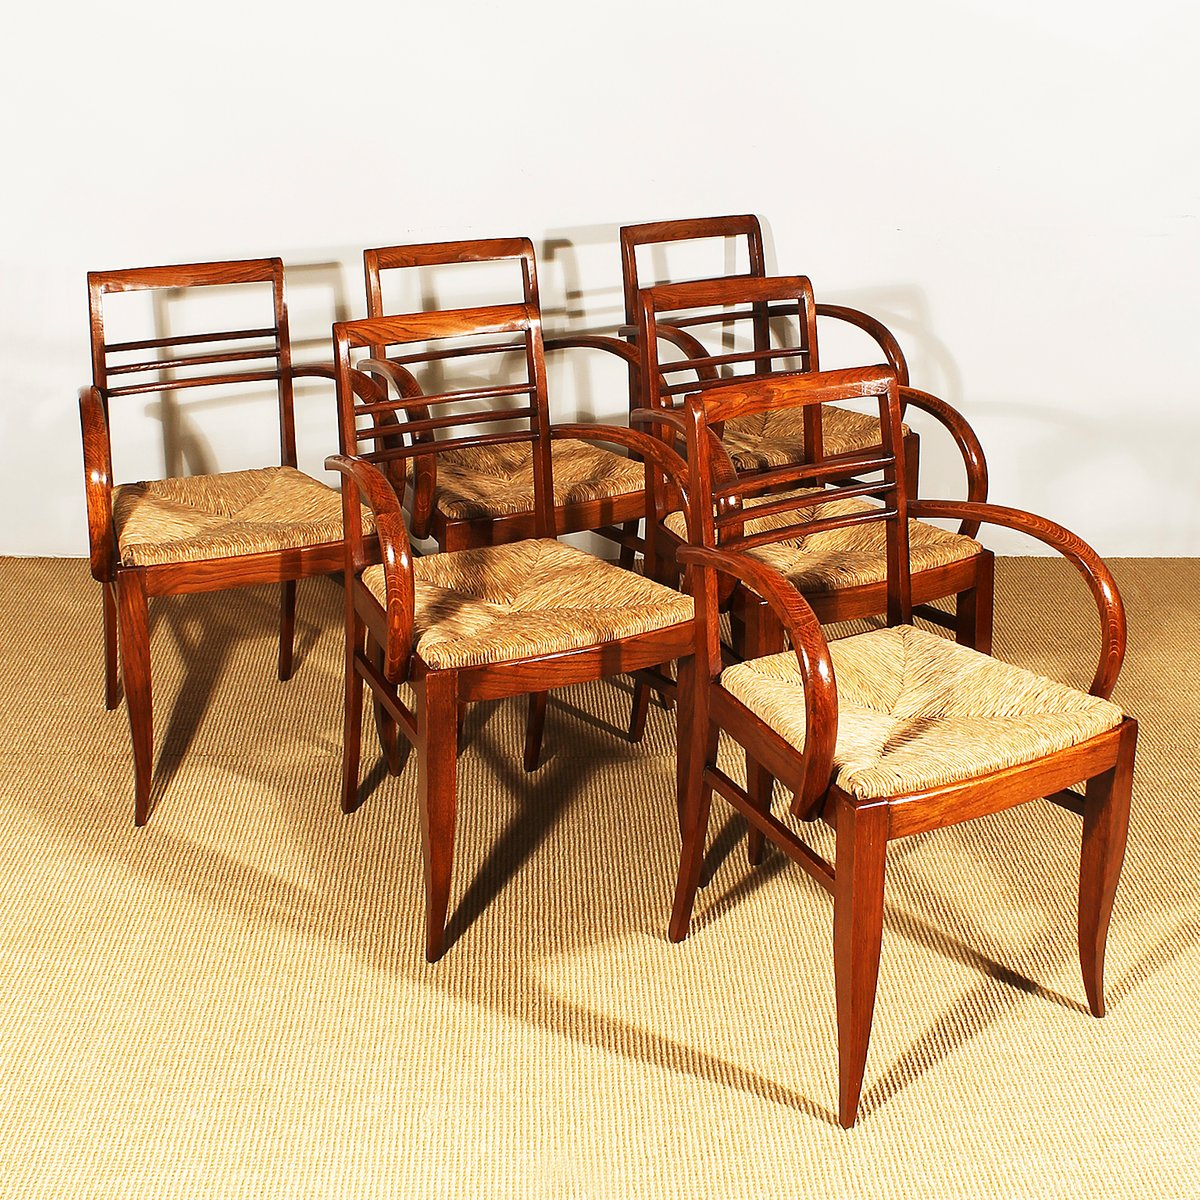 art deco furniture. Art Deco Bridge Chairs In Oak And Straw, 1930s, Set Of 6 Furniture